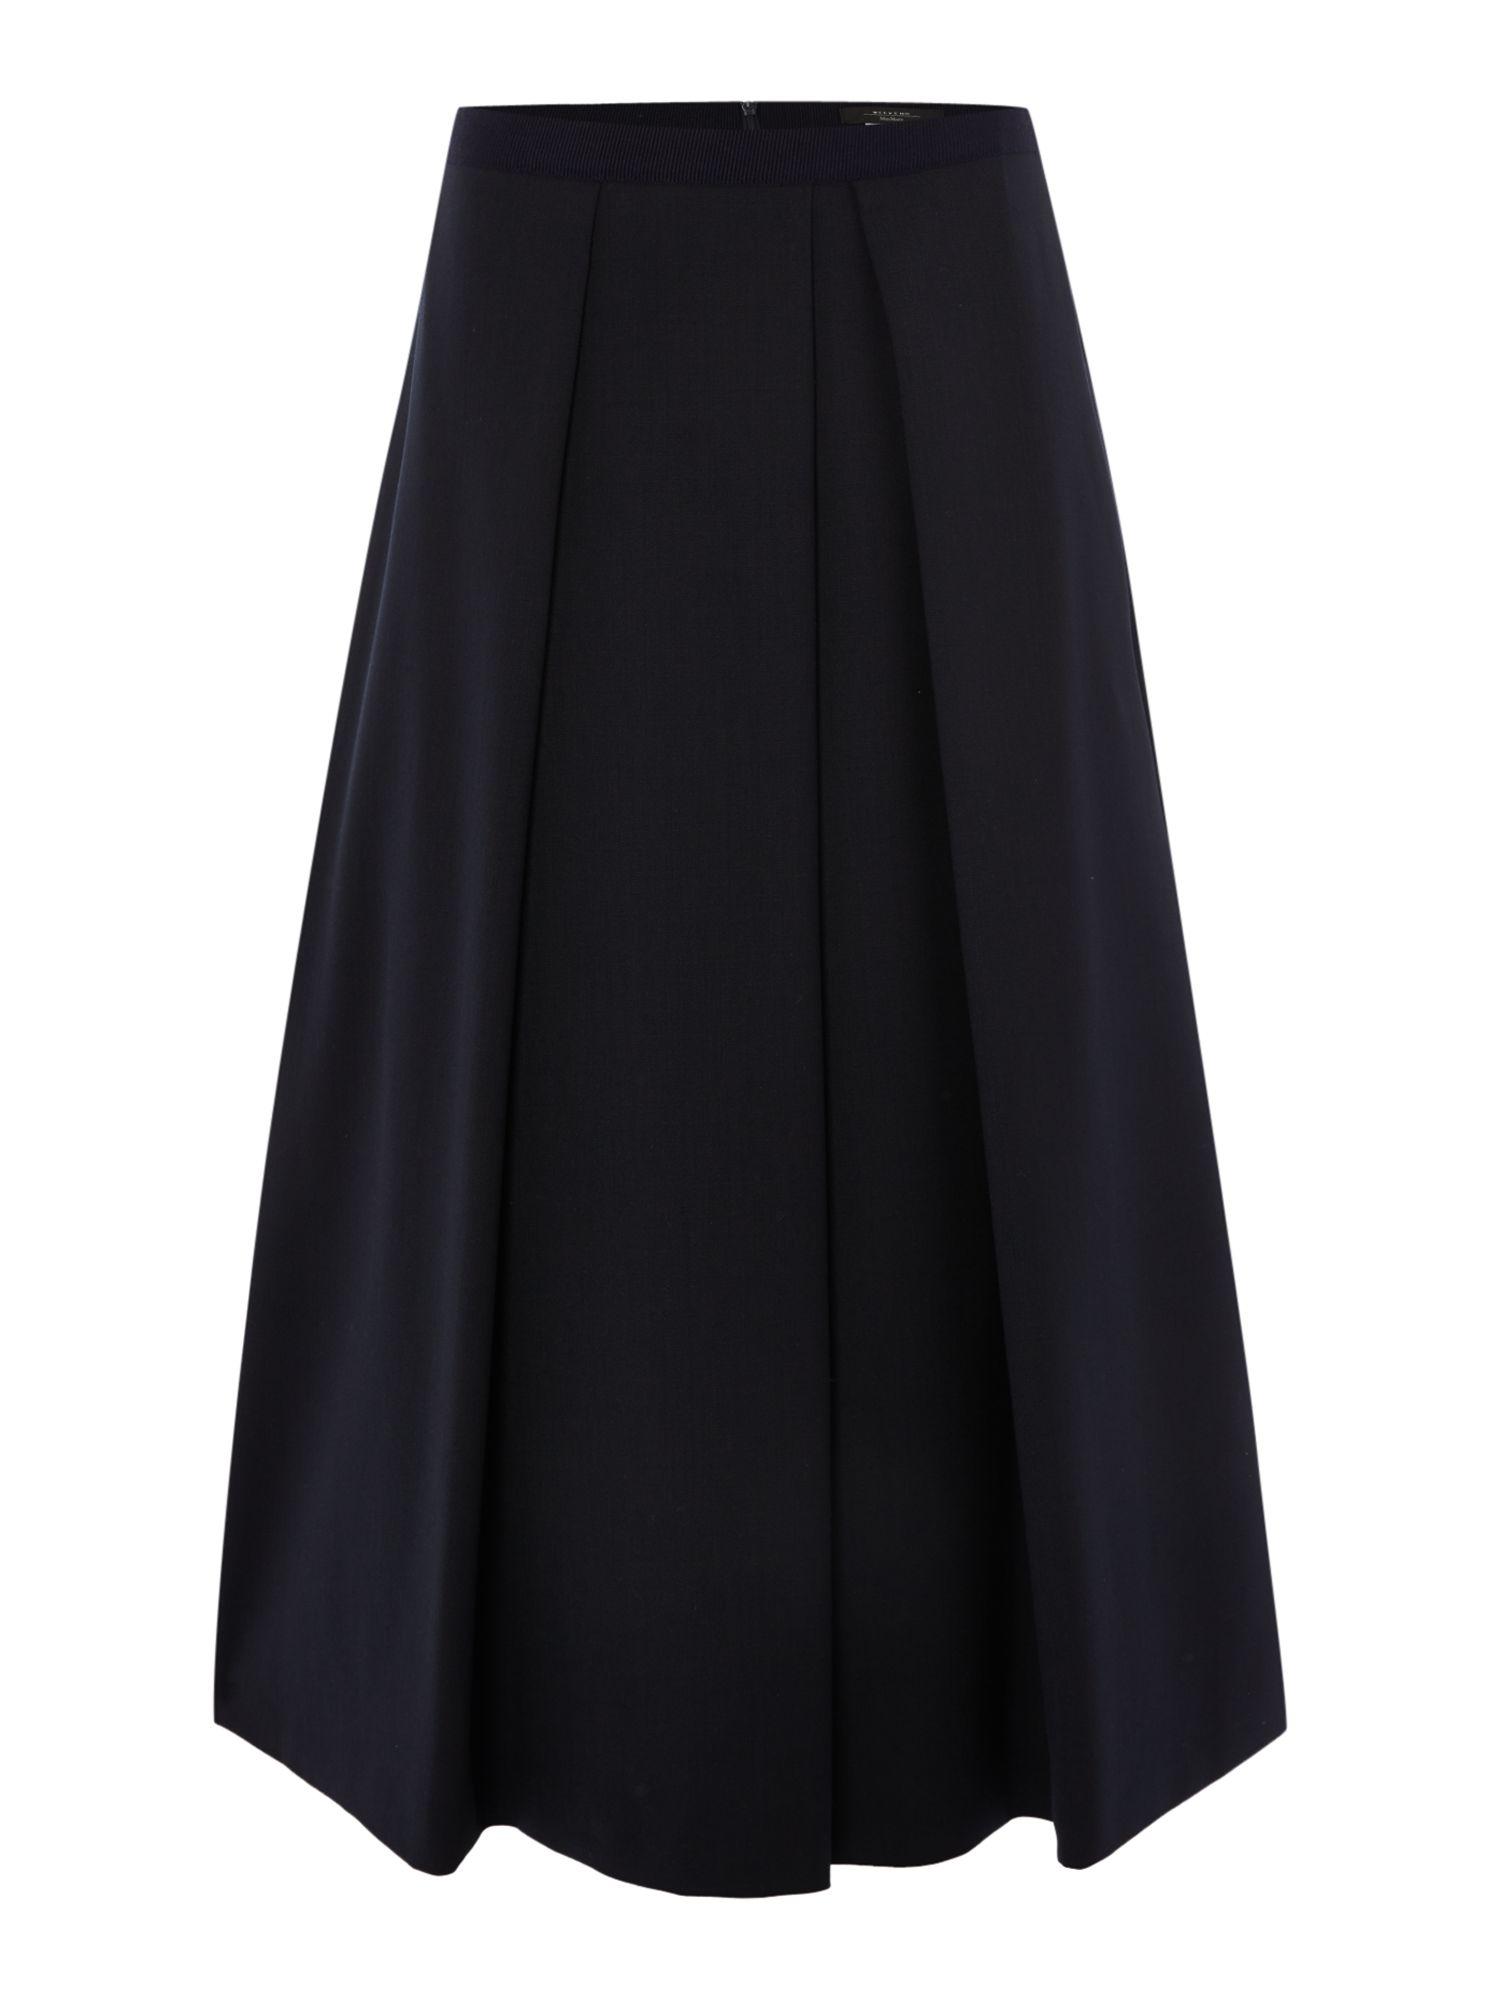 Max mara Necton Pleated Virgin Wool Midi Skirt in Black | Lyst